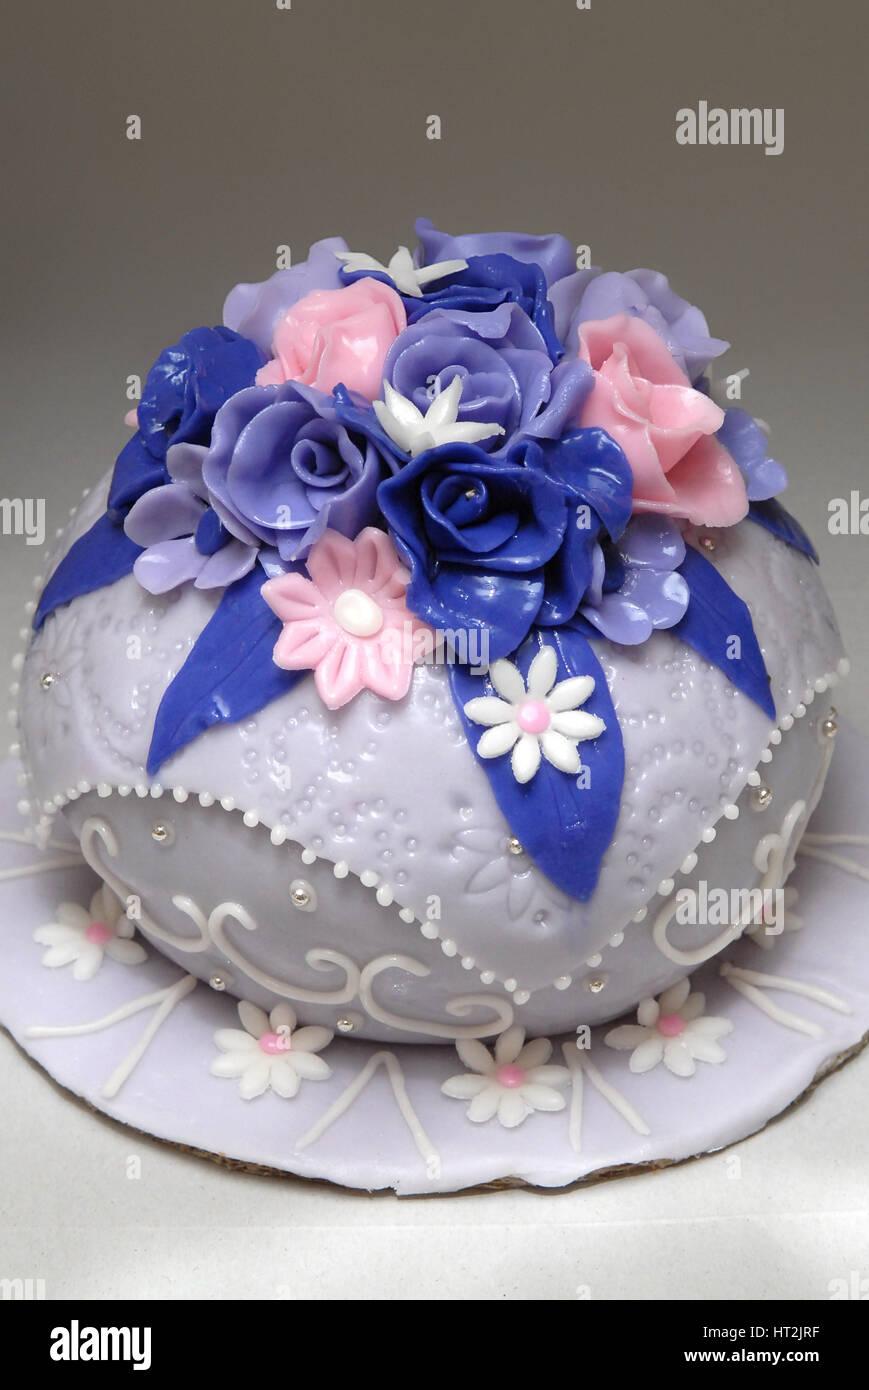 Bride Groom Cake Decoration Blue Pink Stock Photos Bride Groom